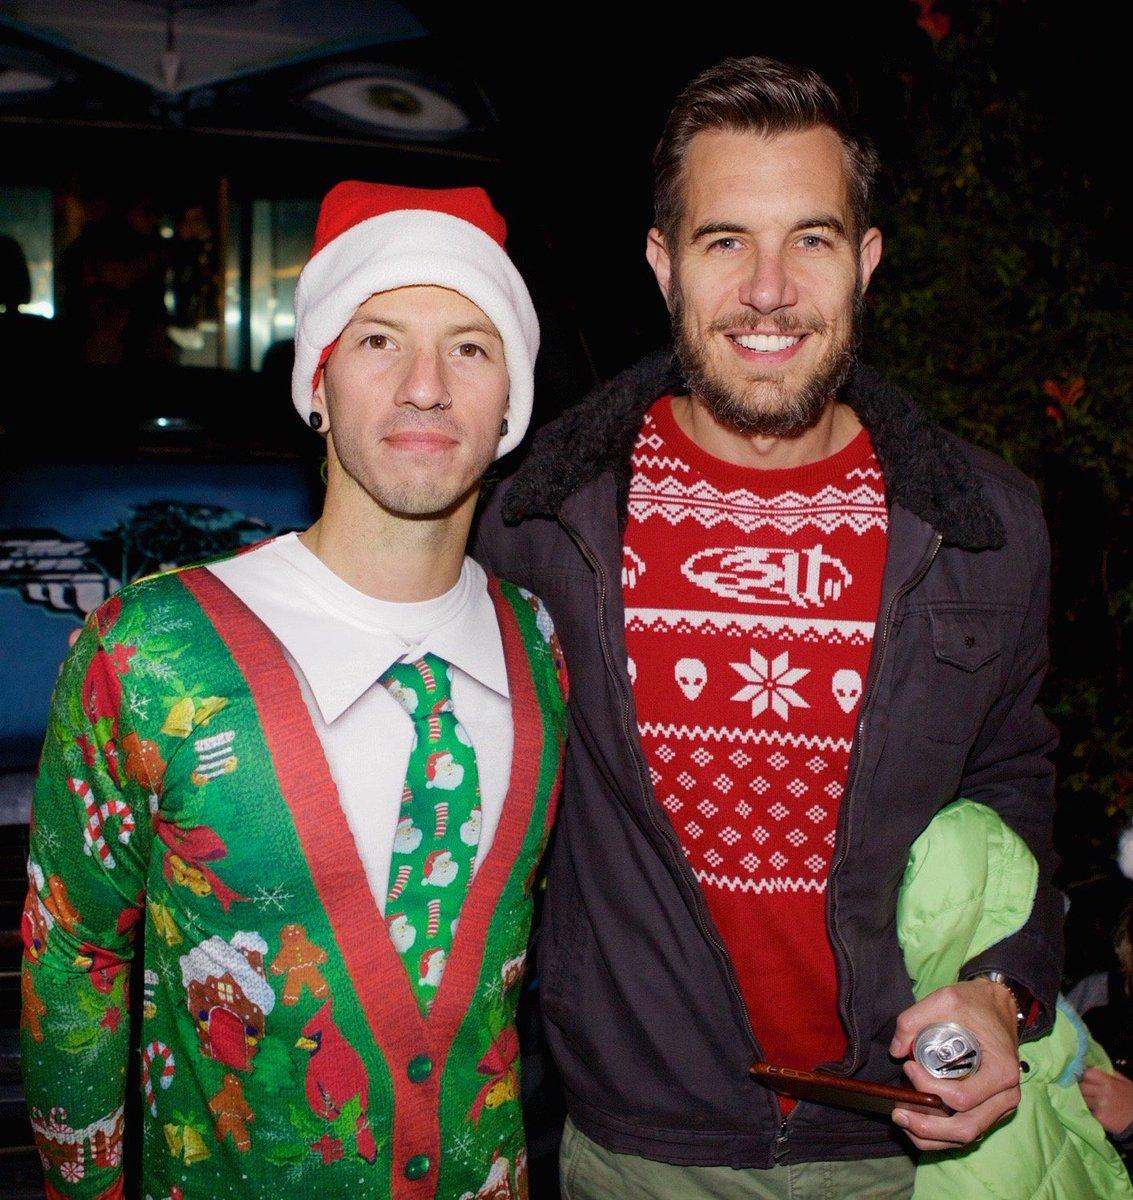 Holiday sweaters in effect! @joshuadun of @twentyonepilots & @NickHexum of @311 taking in a holiday party! https://t.co/ERuRiVyPKp